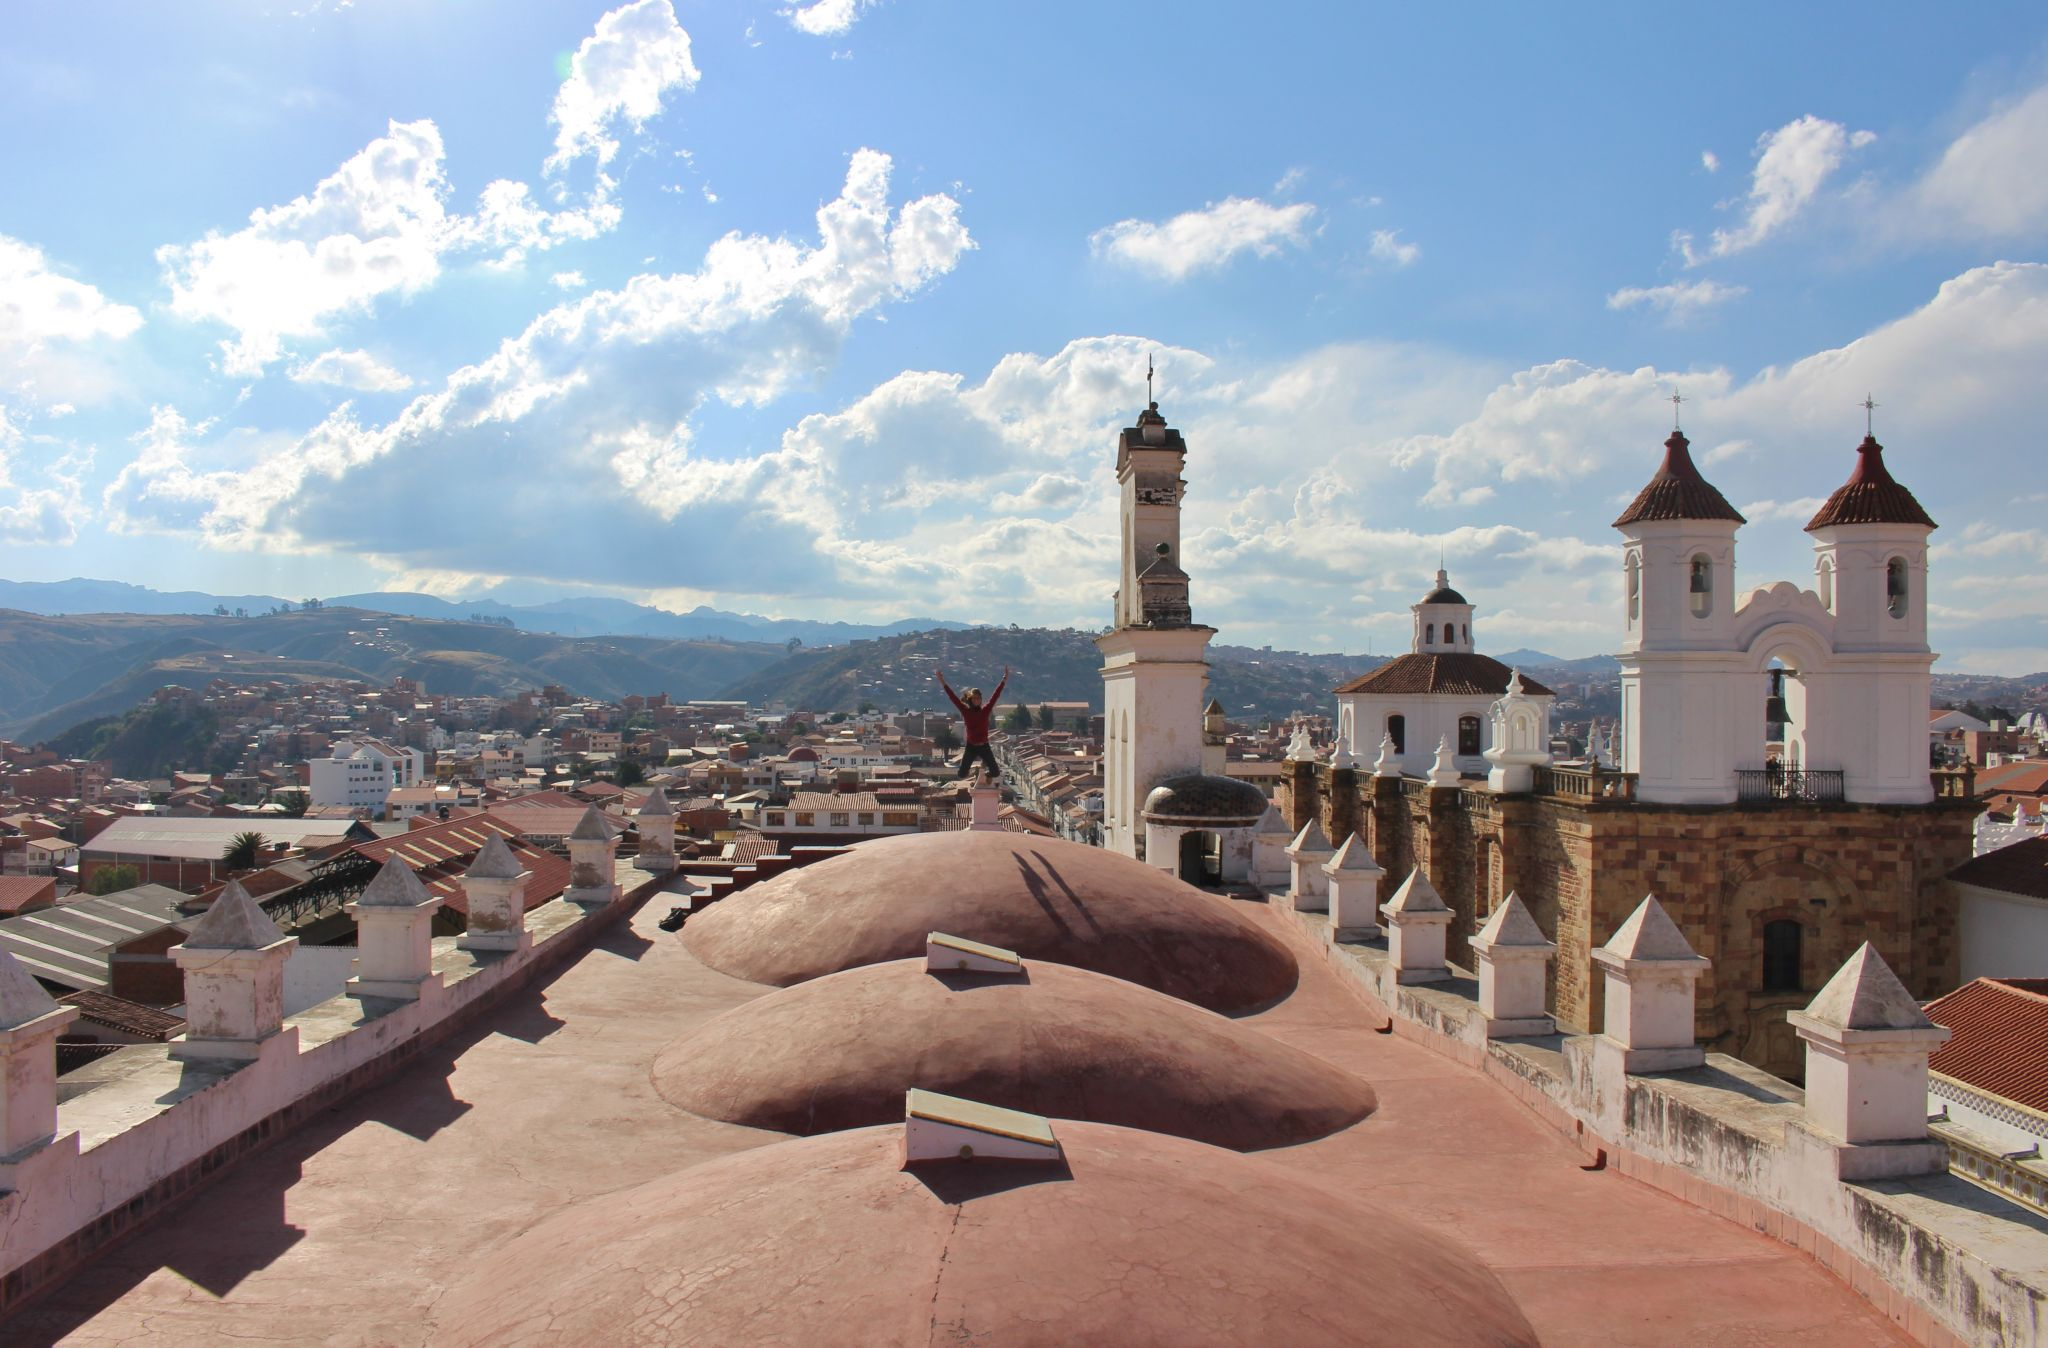 Roof of Iglesia la Merced, Bolivia